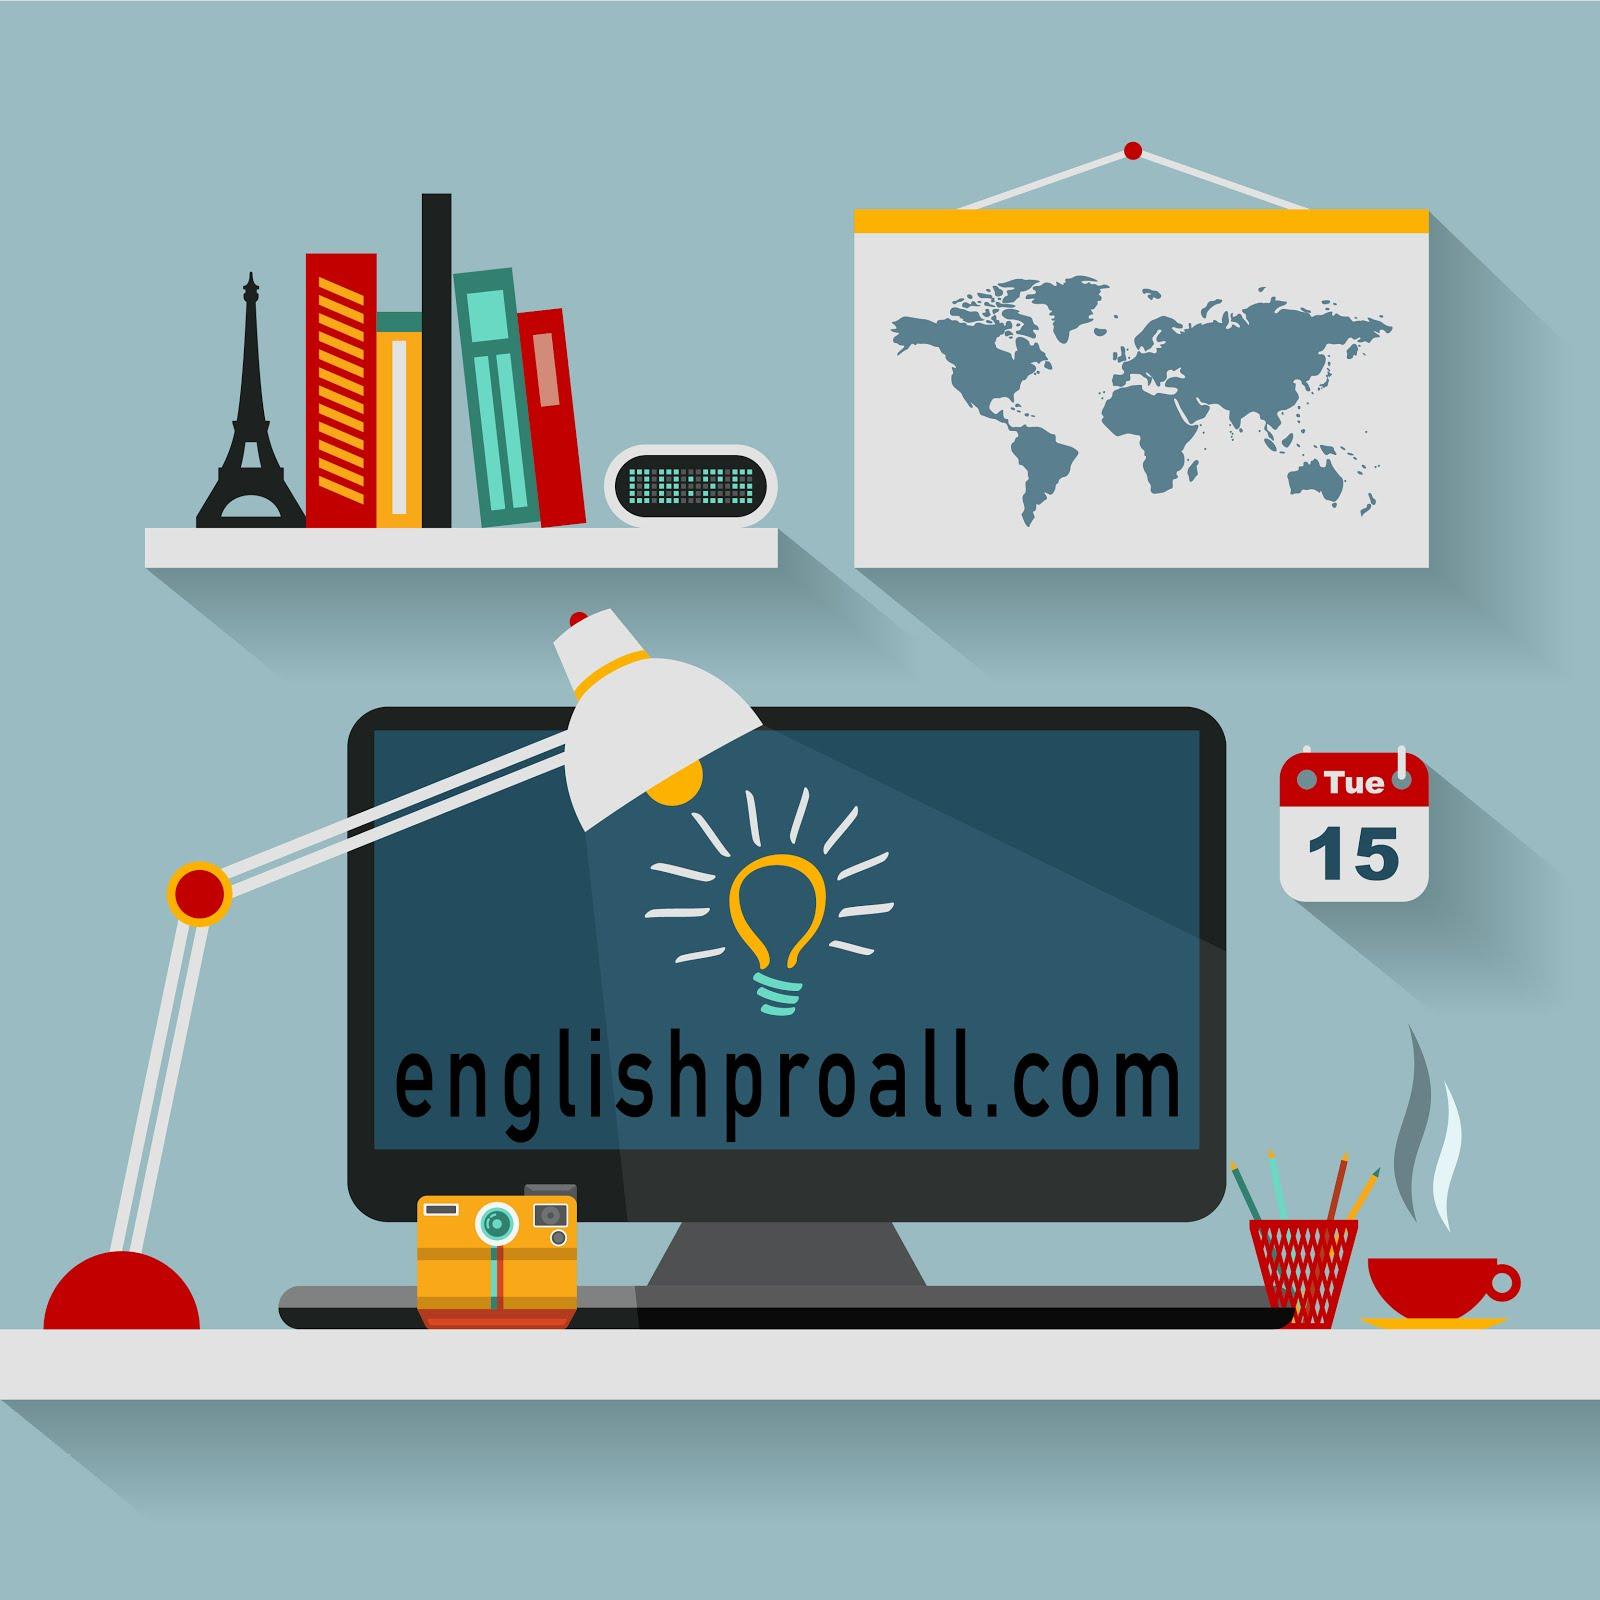 www.englishproall.com